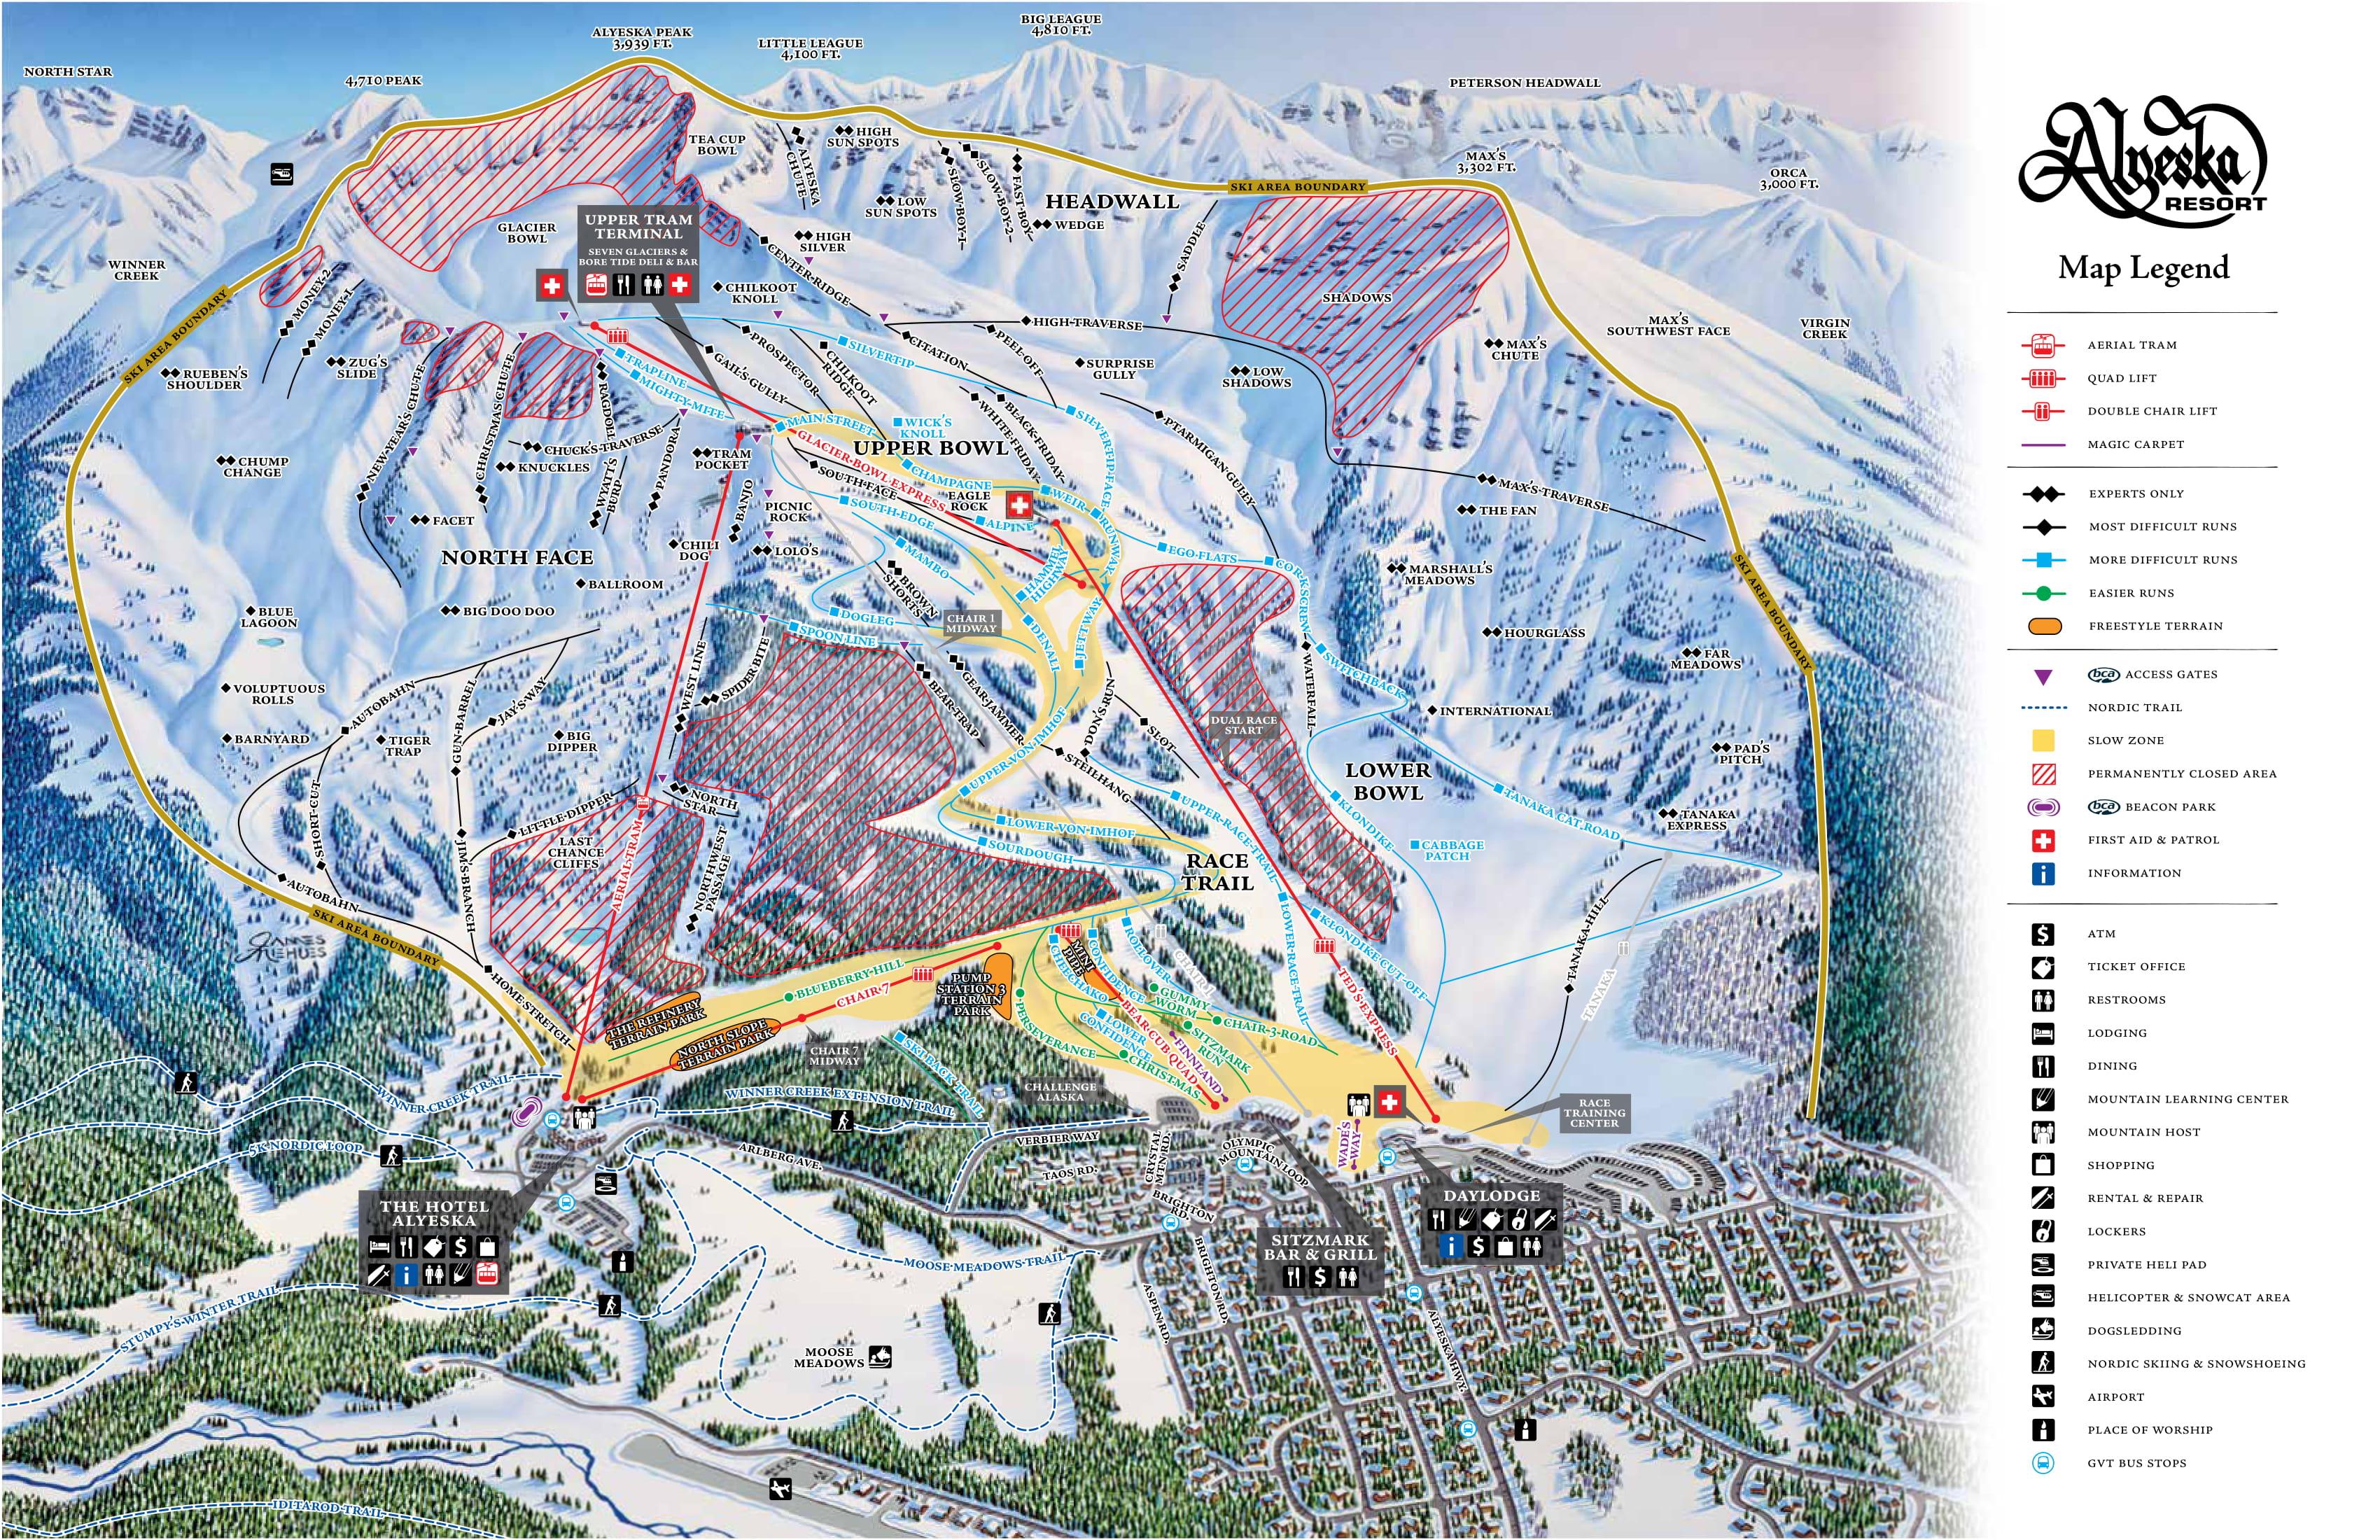 Alyeska Resort Ski Resort Lift Ticket Information Snowpak